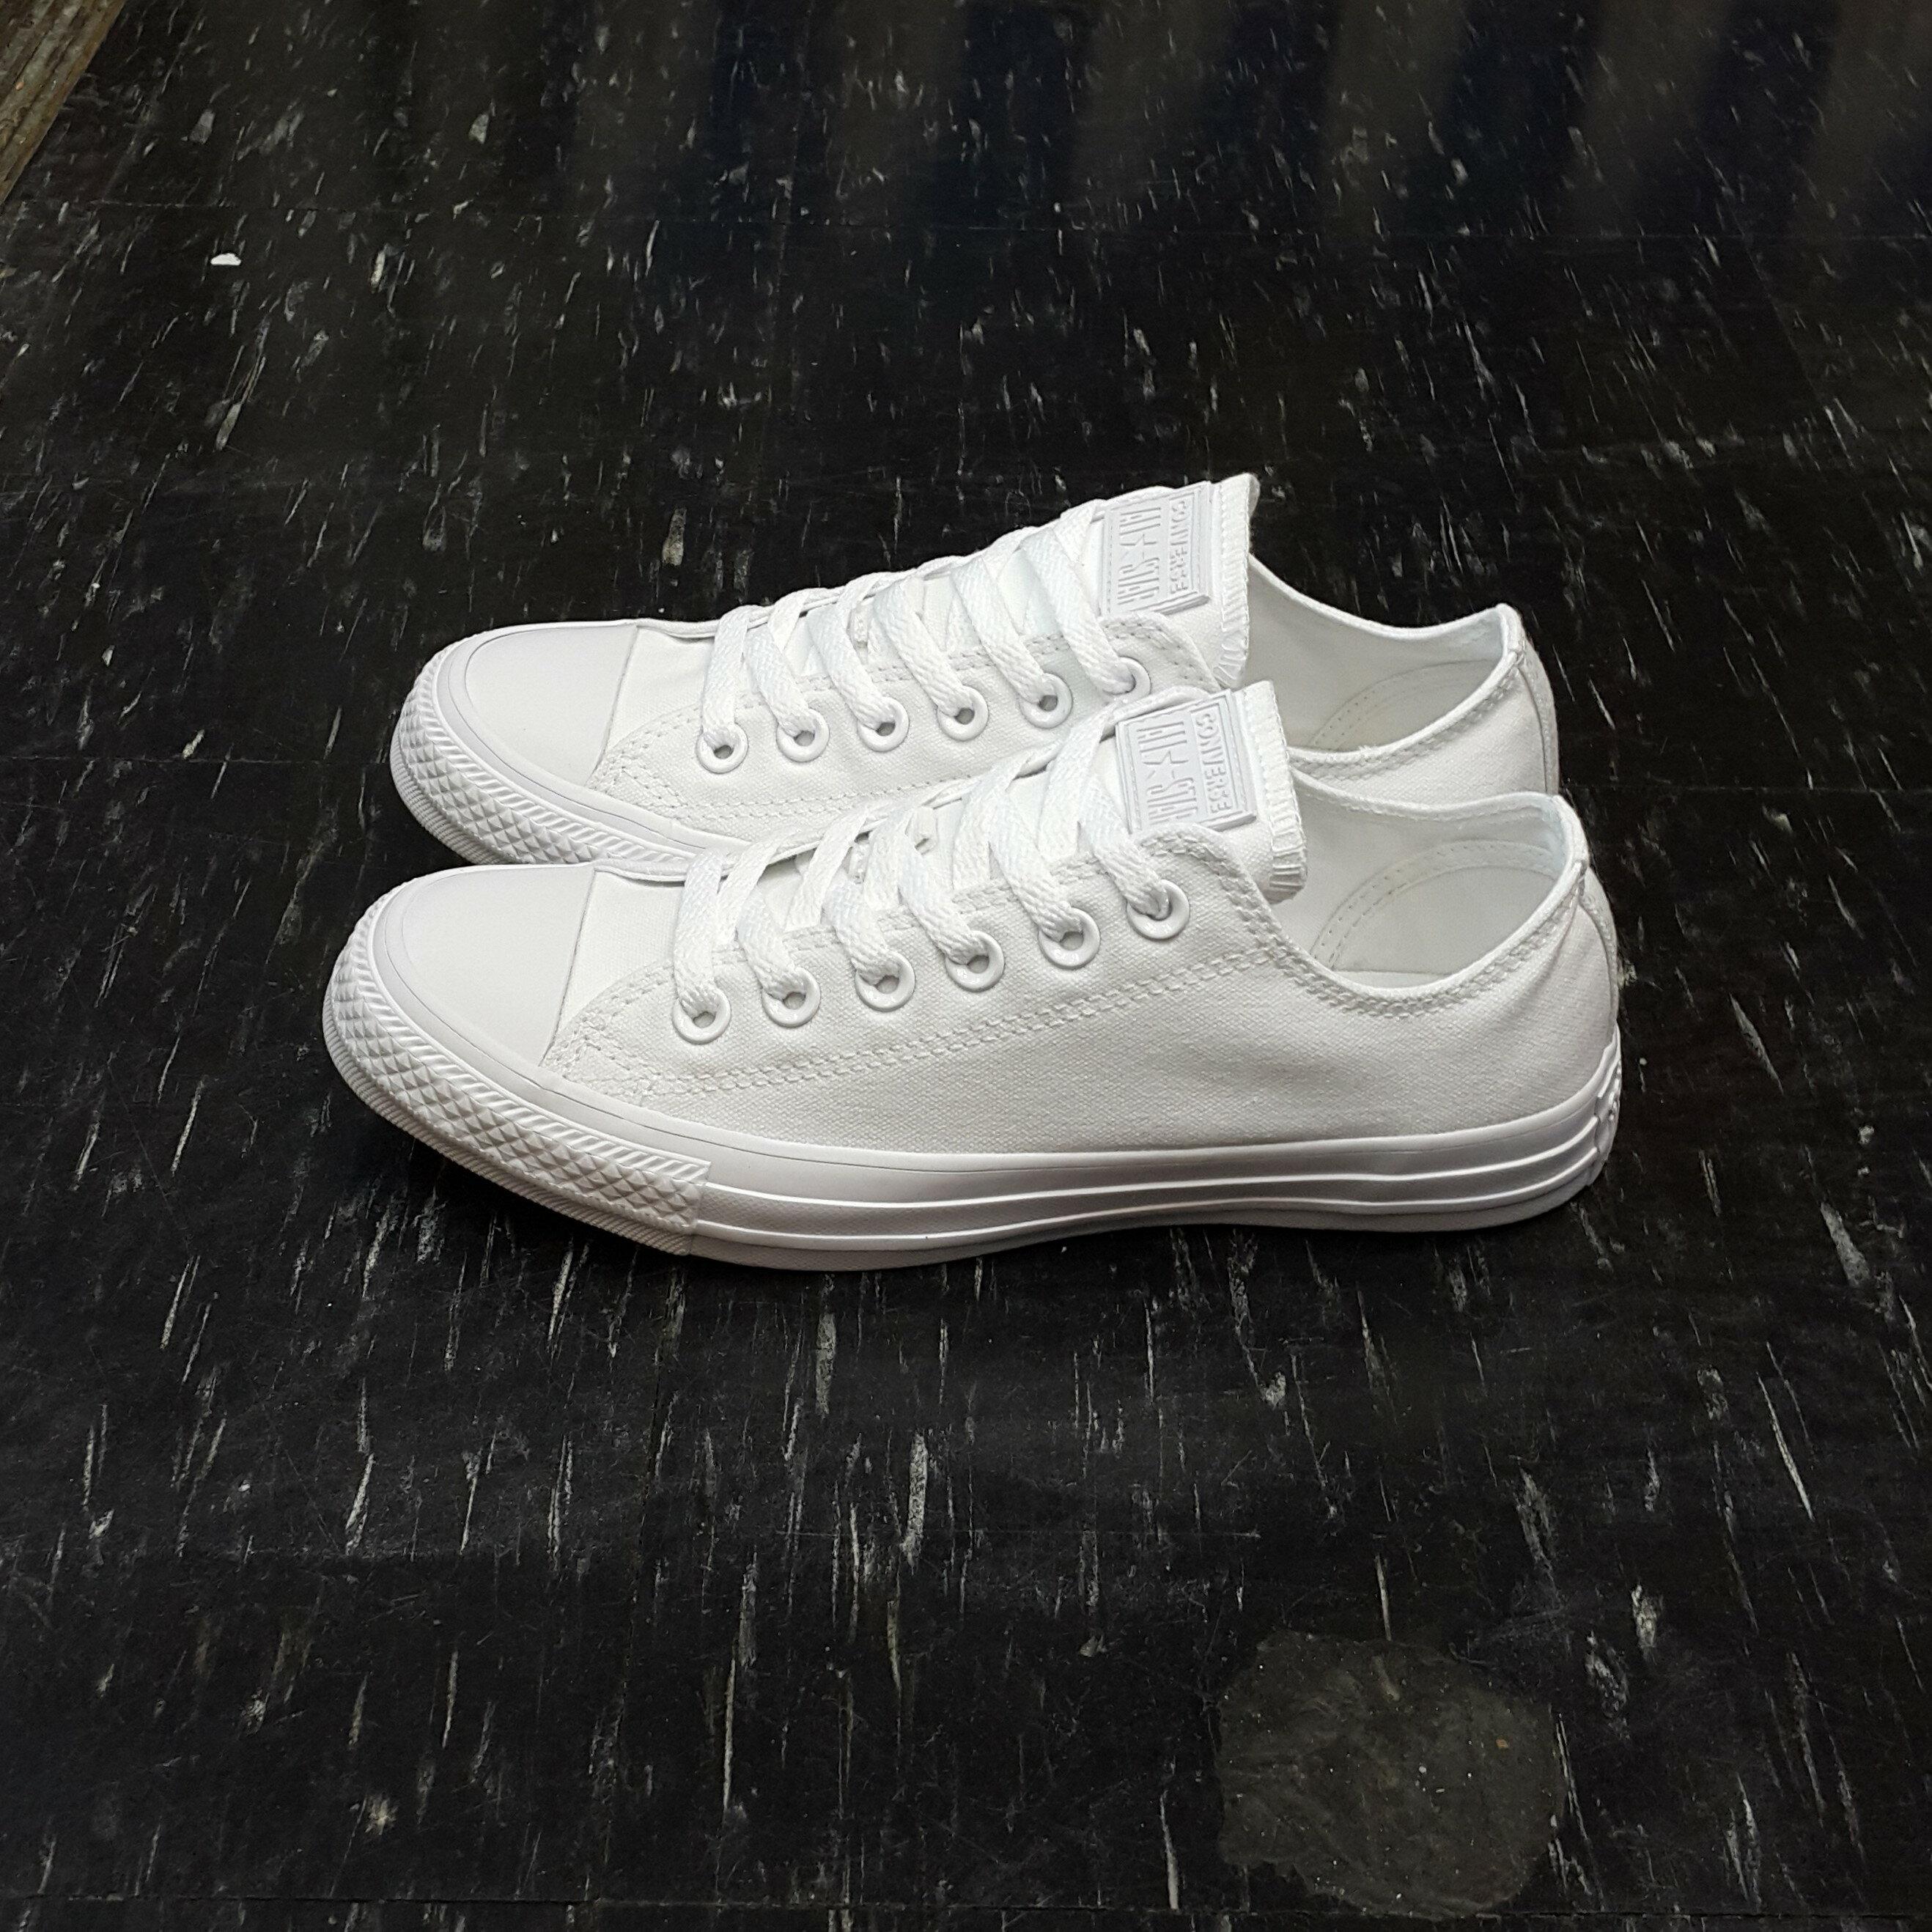 Converse Chuck Taylor All Star Seasonal 白色 全白 帆布 小白鞋 基本款 低筒 1U647